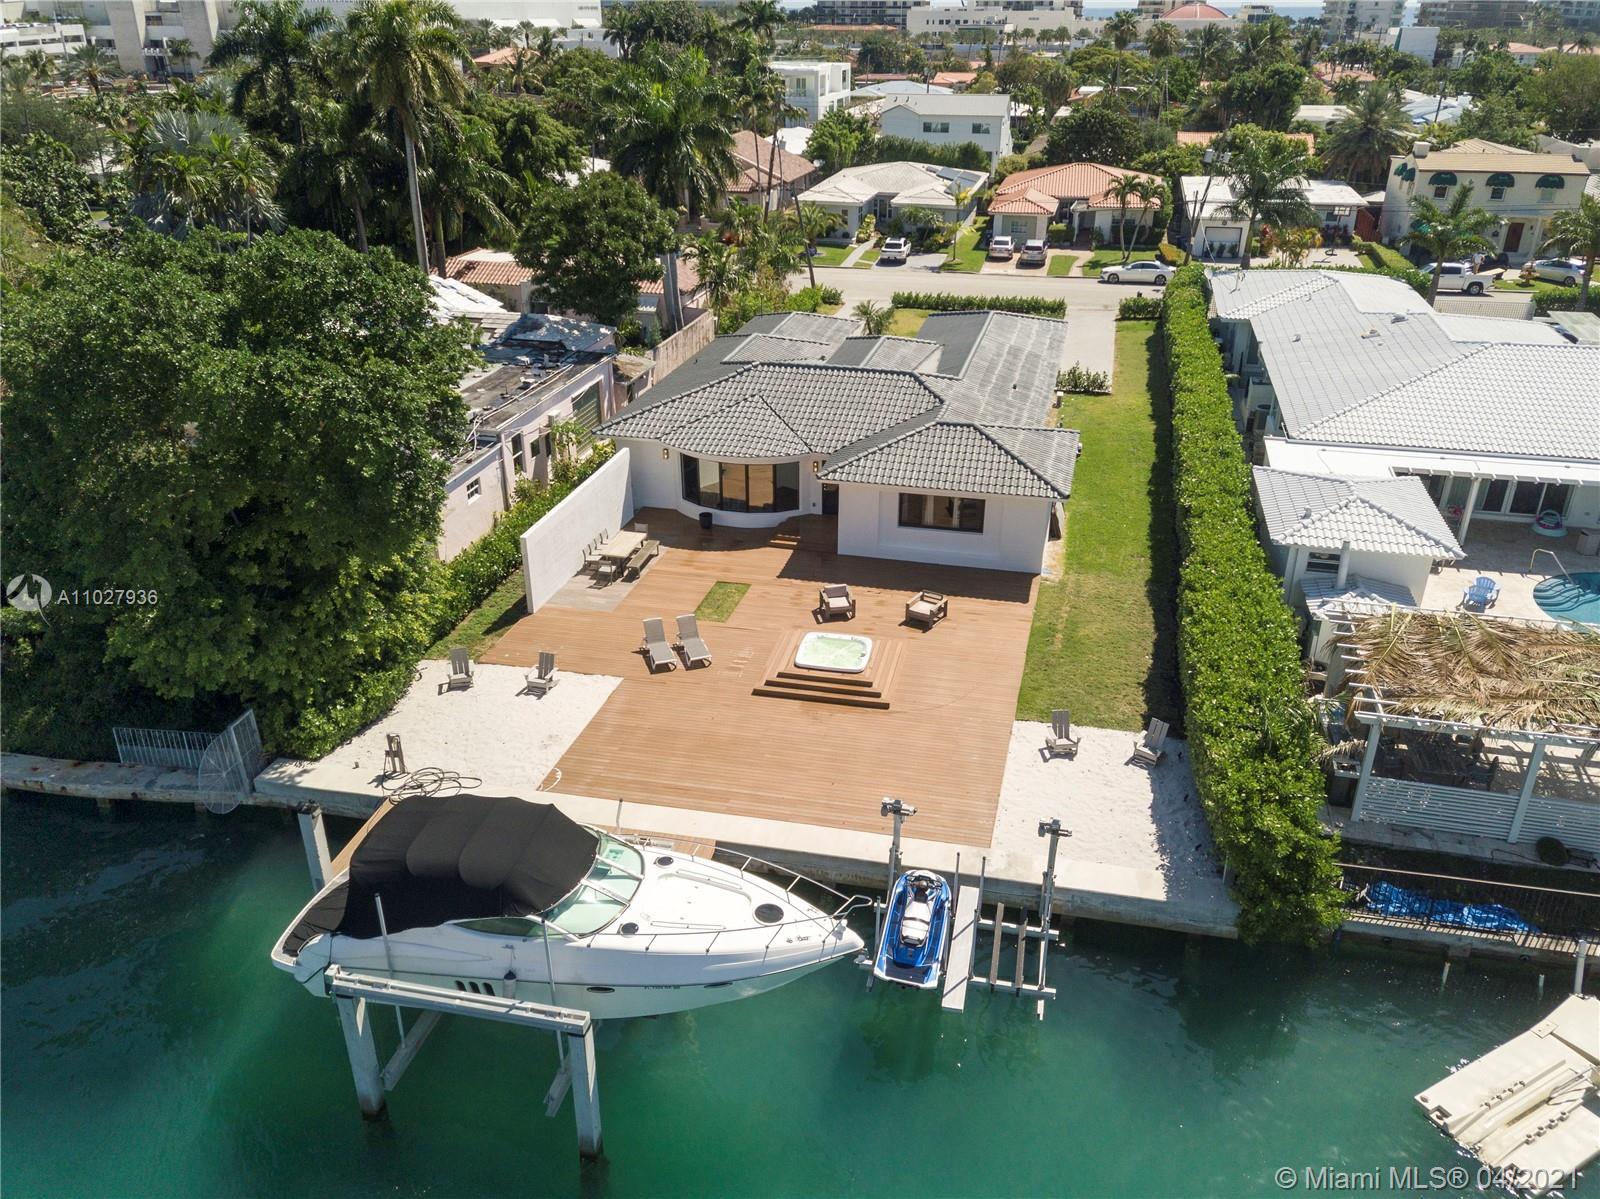 Altos Del Mar - 9528 Bay Dr, Surfside, FL 33154